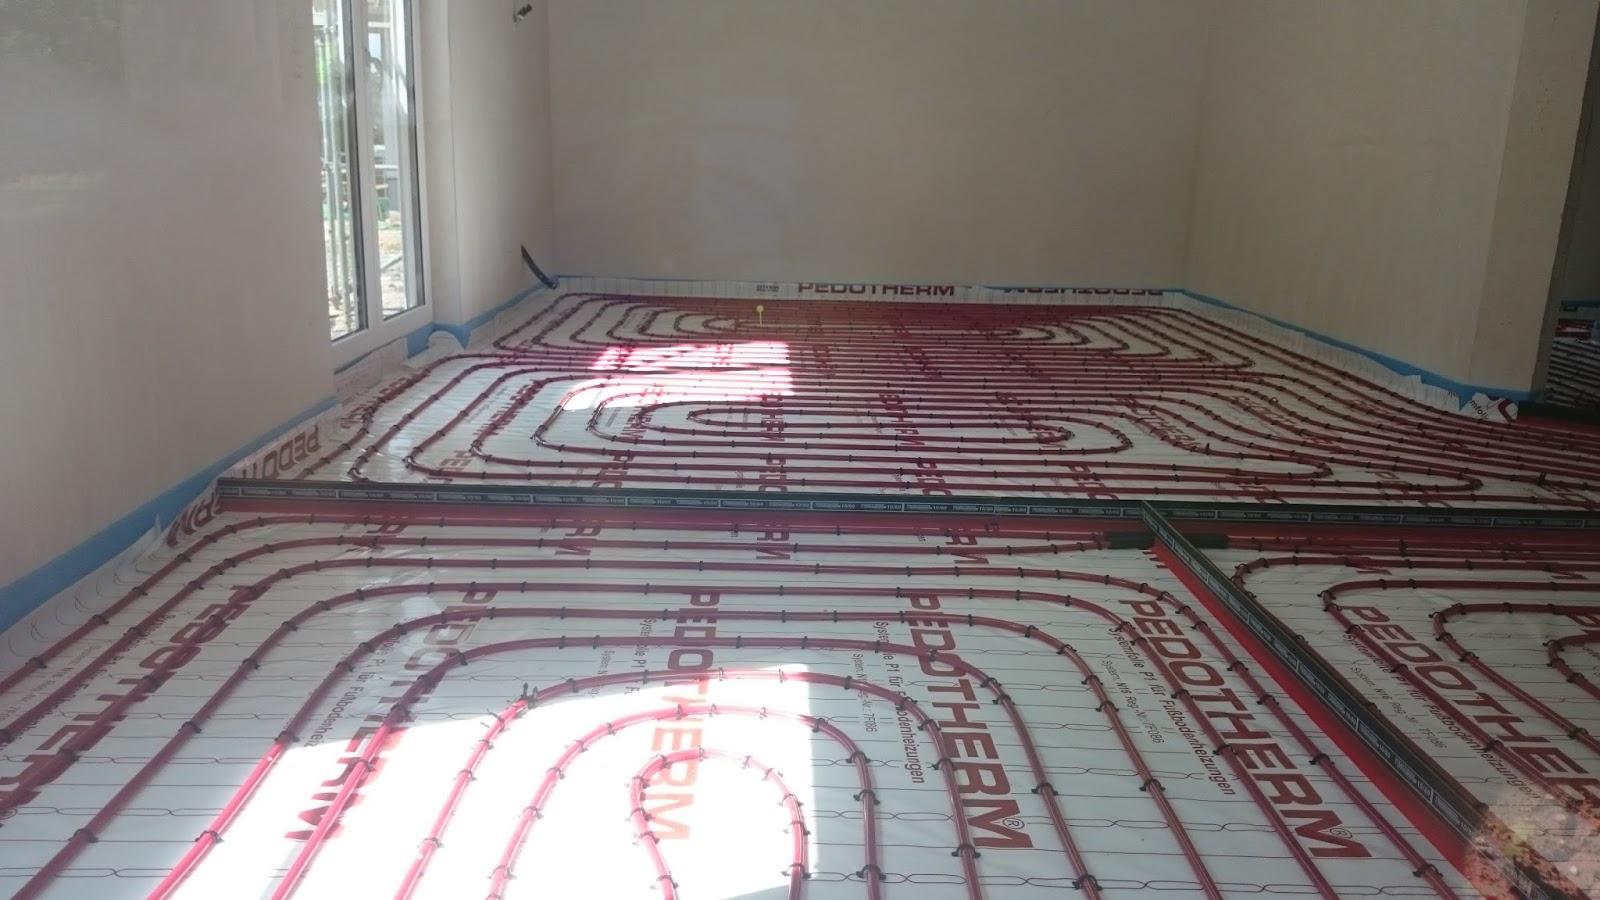 Fliesen Fugenlos Verlegen Fußbodenheizung Wohndesign - Fliesen fugenlos verlegen fußbodenheizung